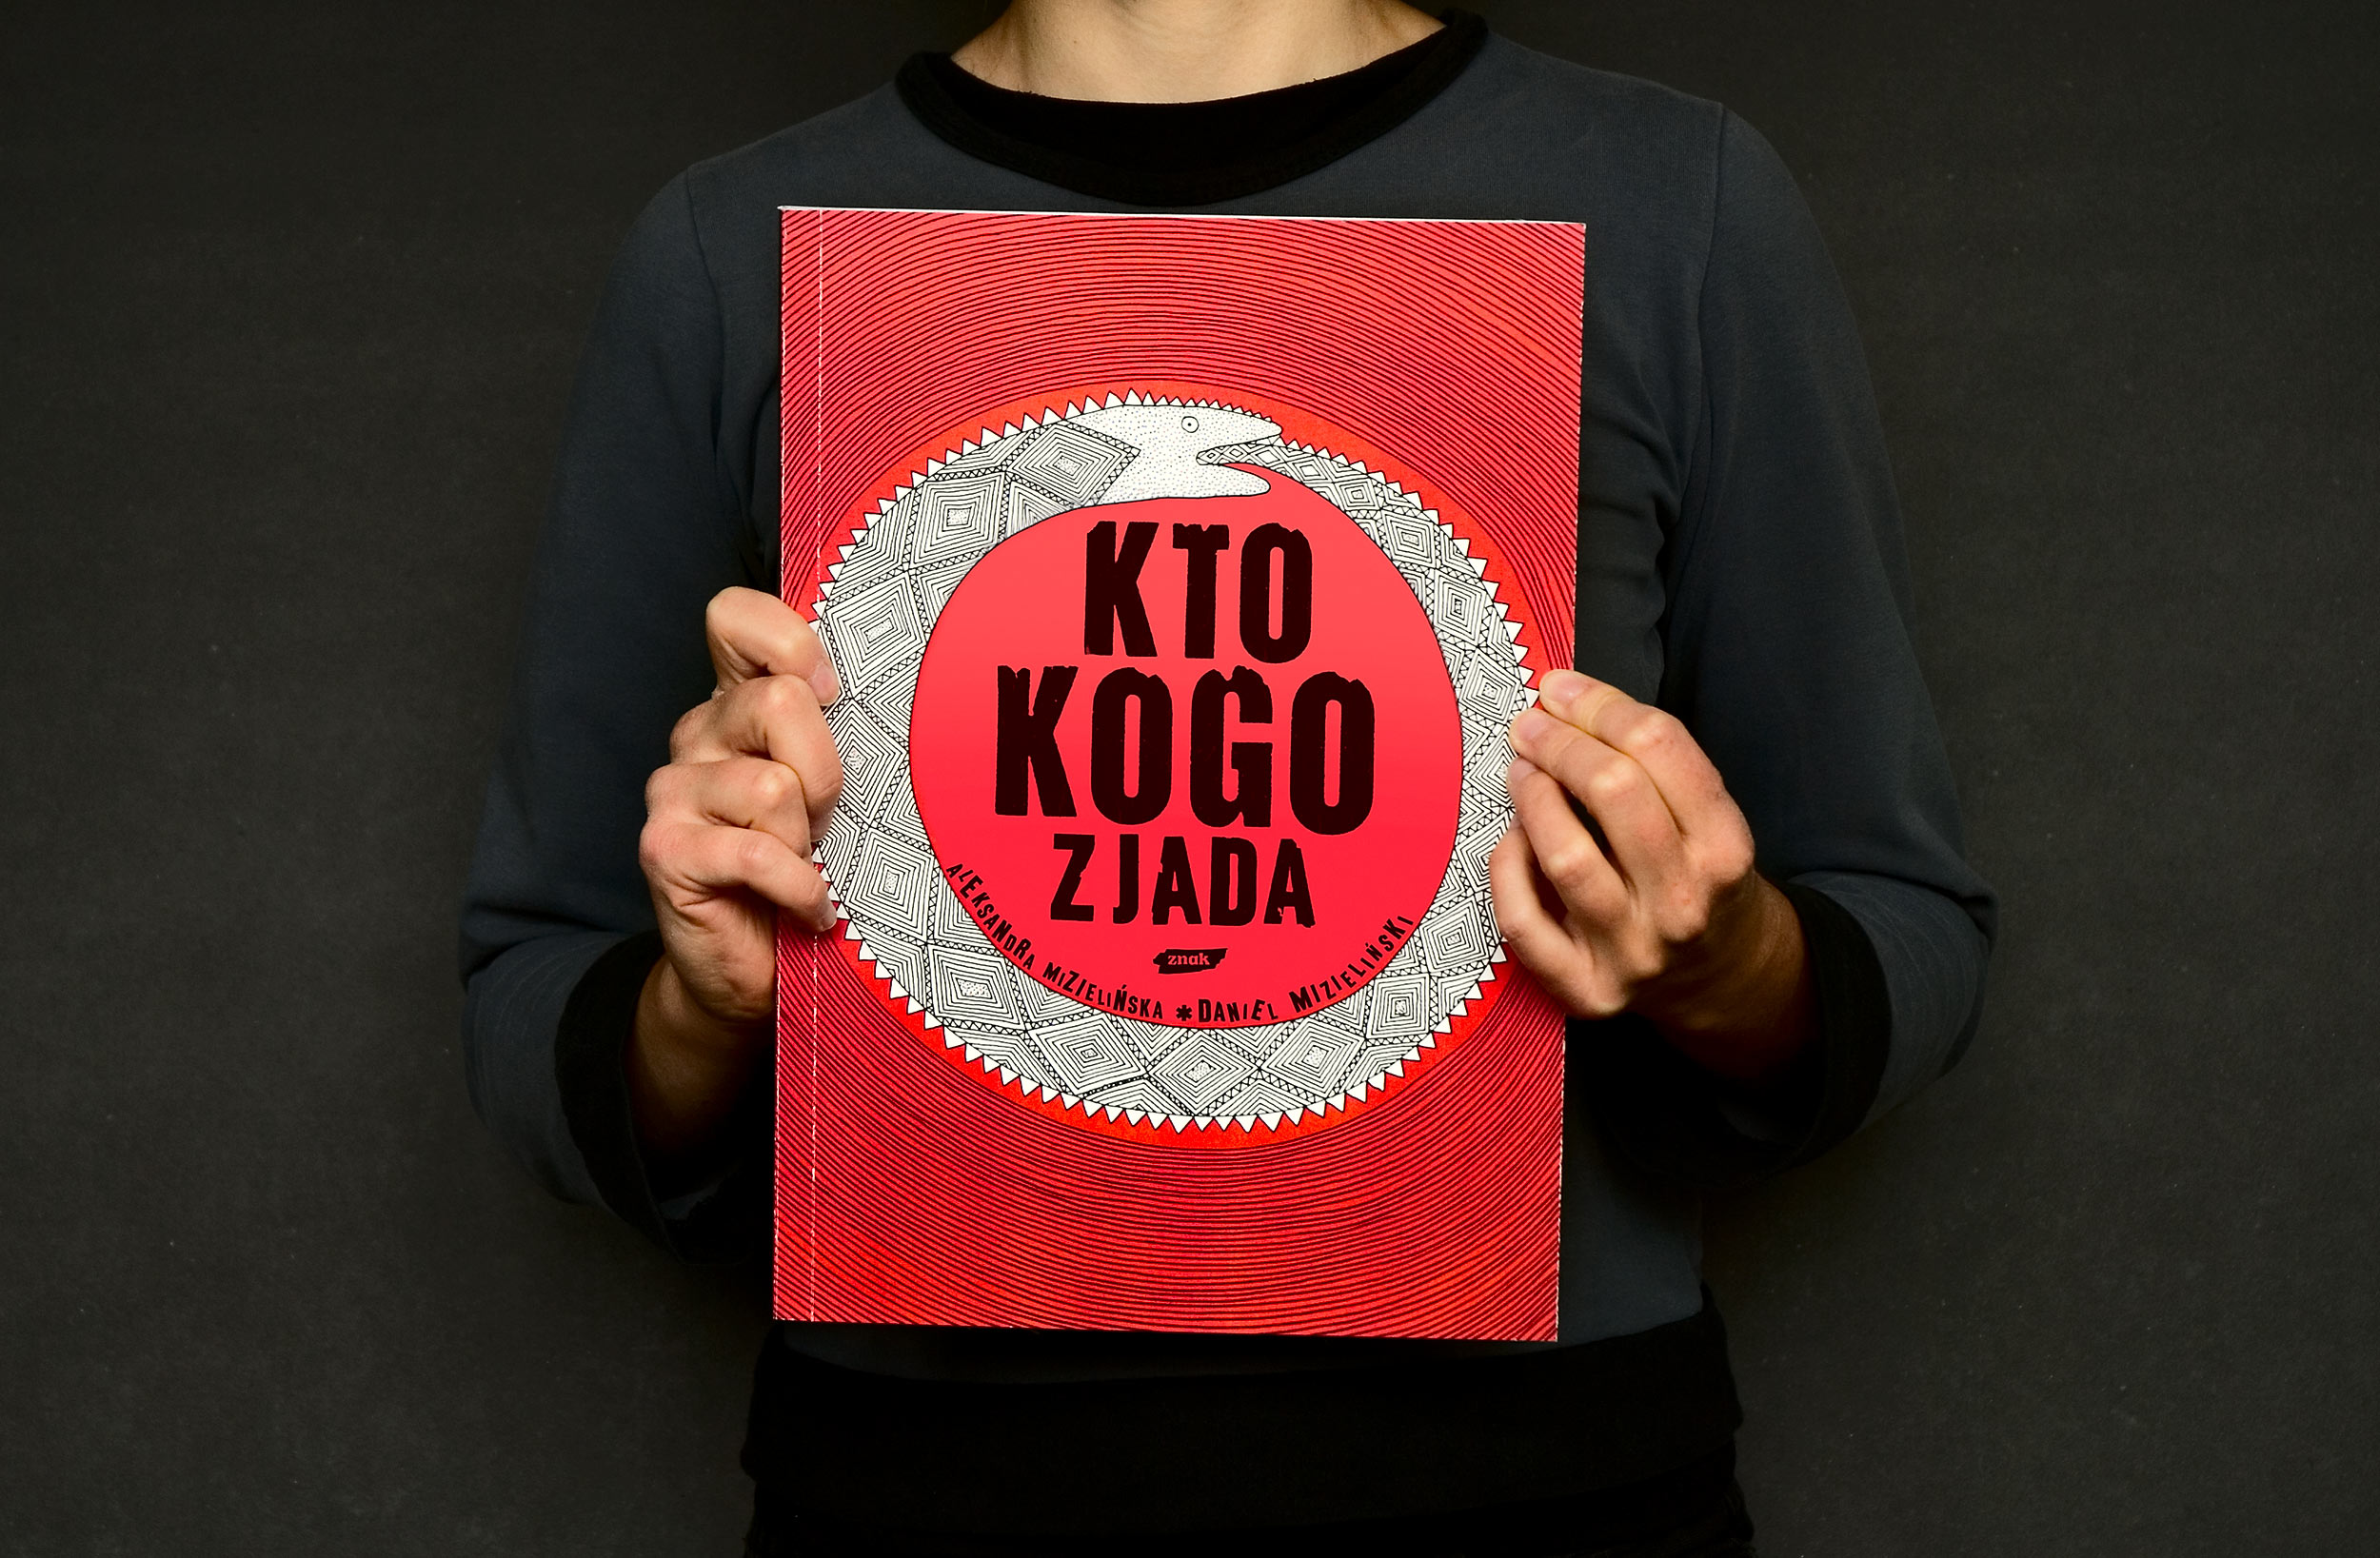 kto-kogo-zjada-01.jpg